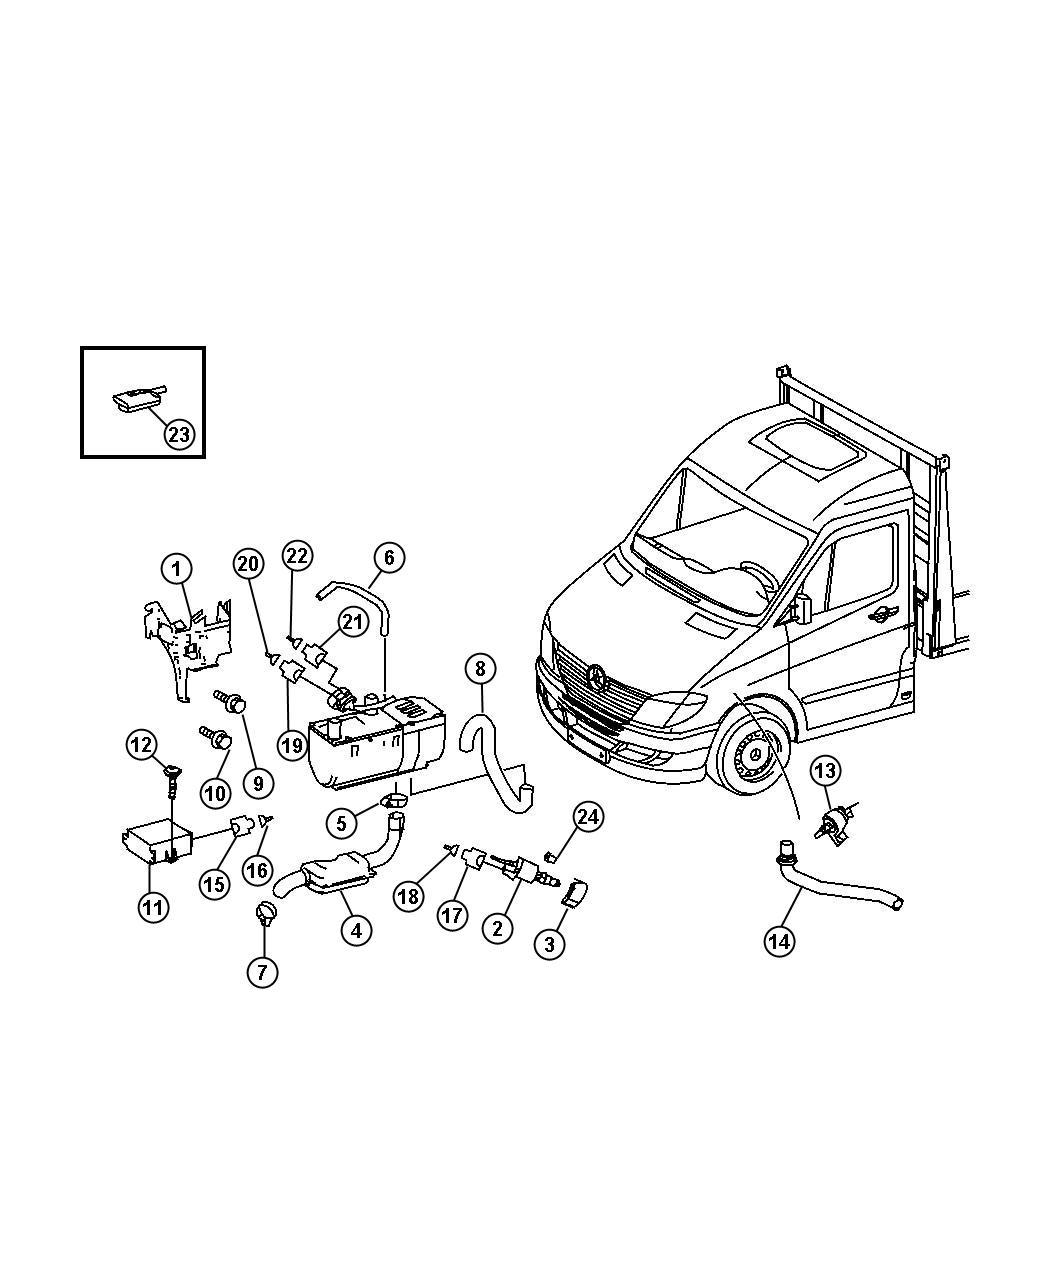 Dodge Sprinter Remote Radio With Remote Control For Aux